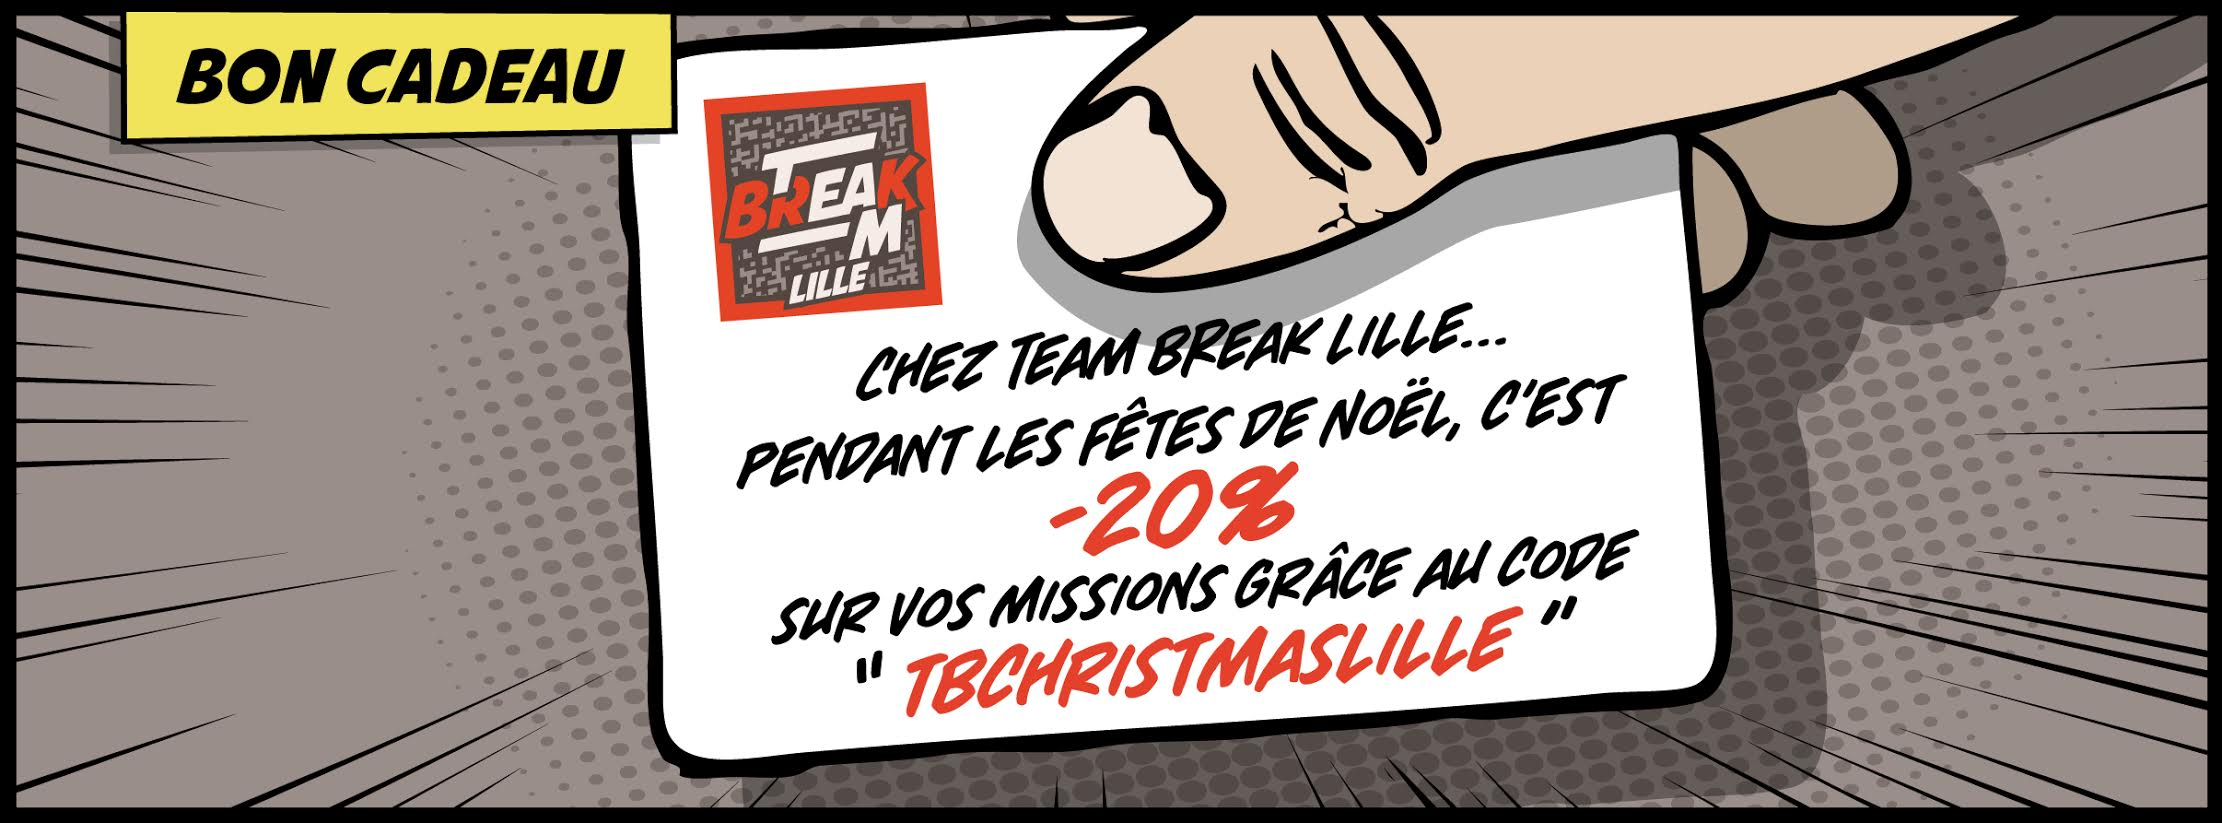 Team Break - escape Game - bon kdo Noel